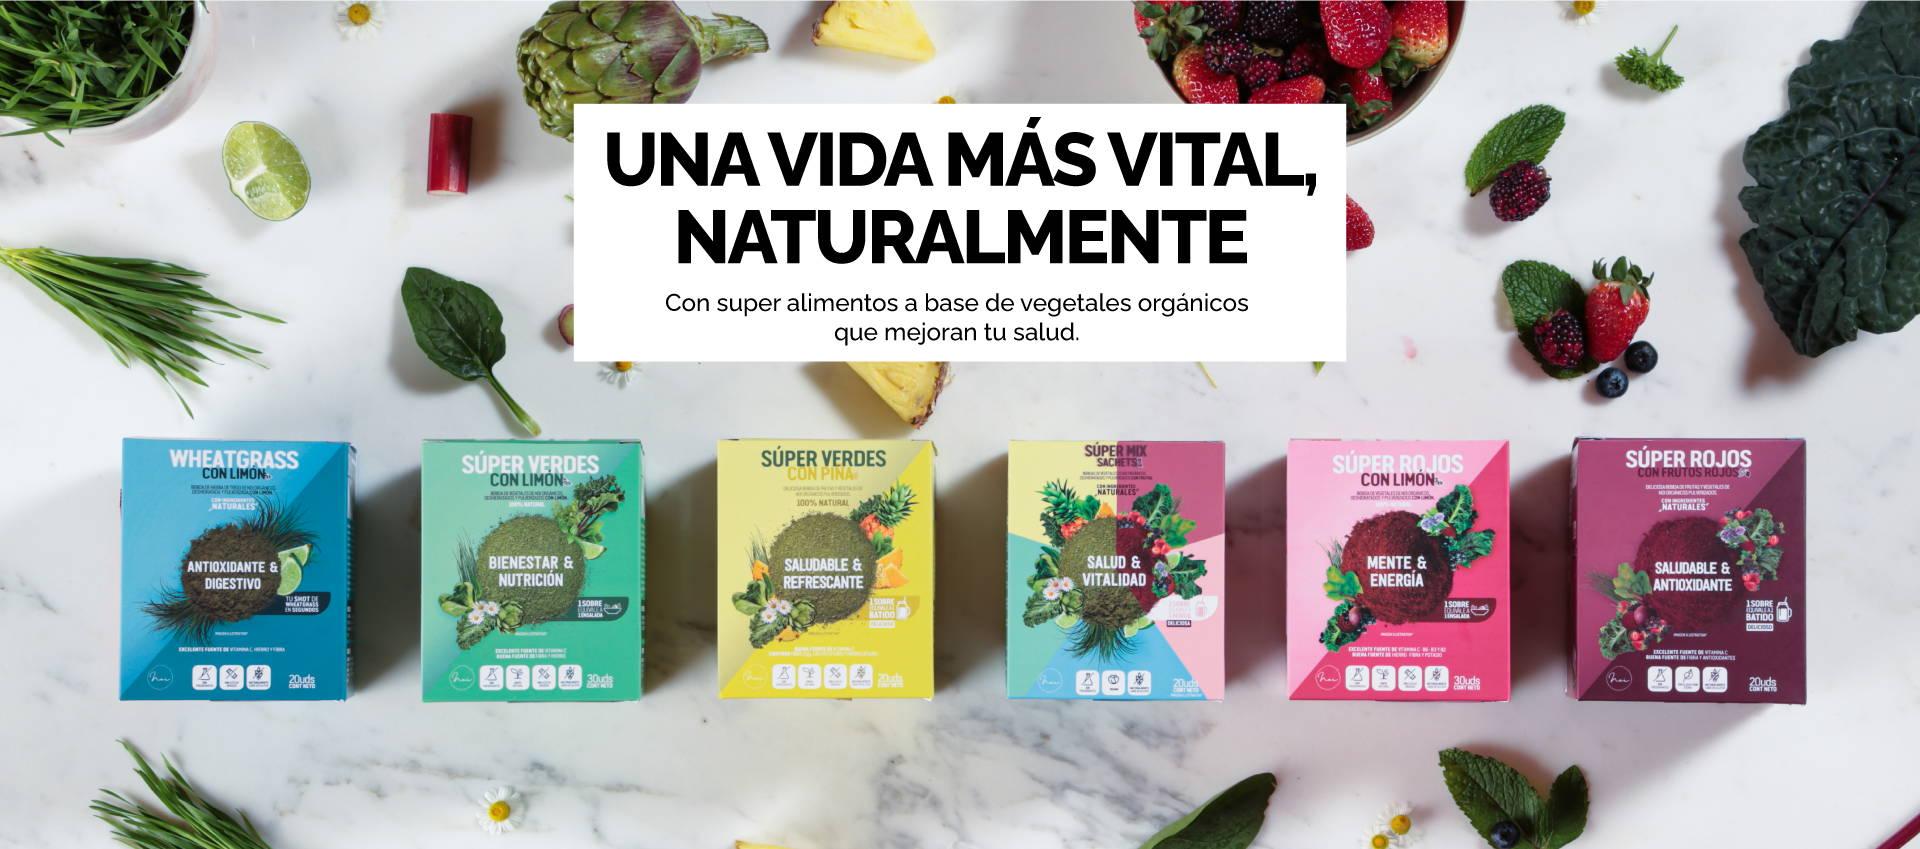 super alimentos a base de vegetales organicos